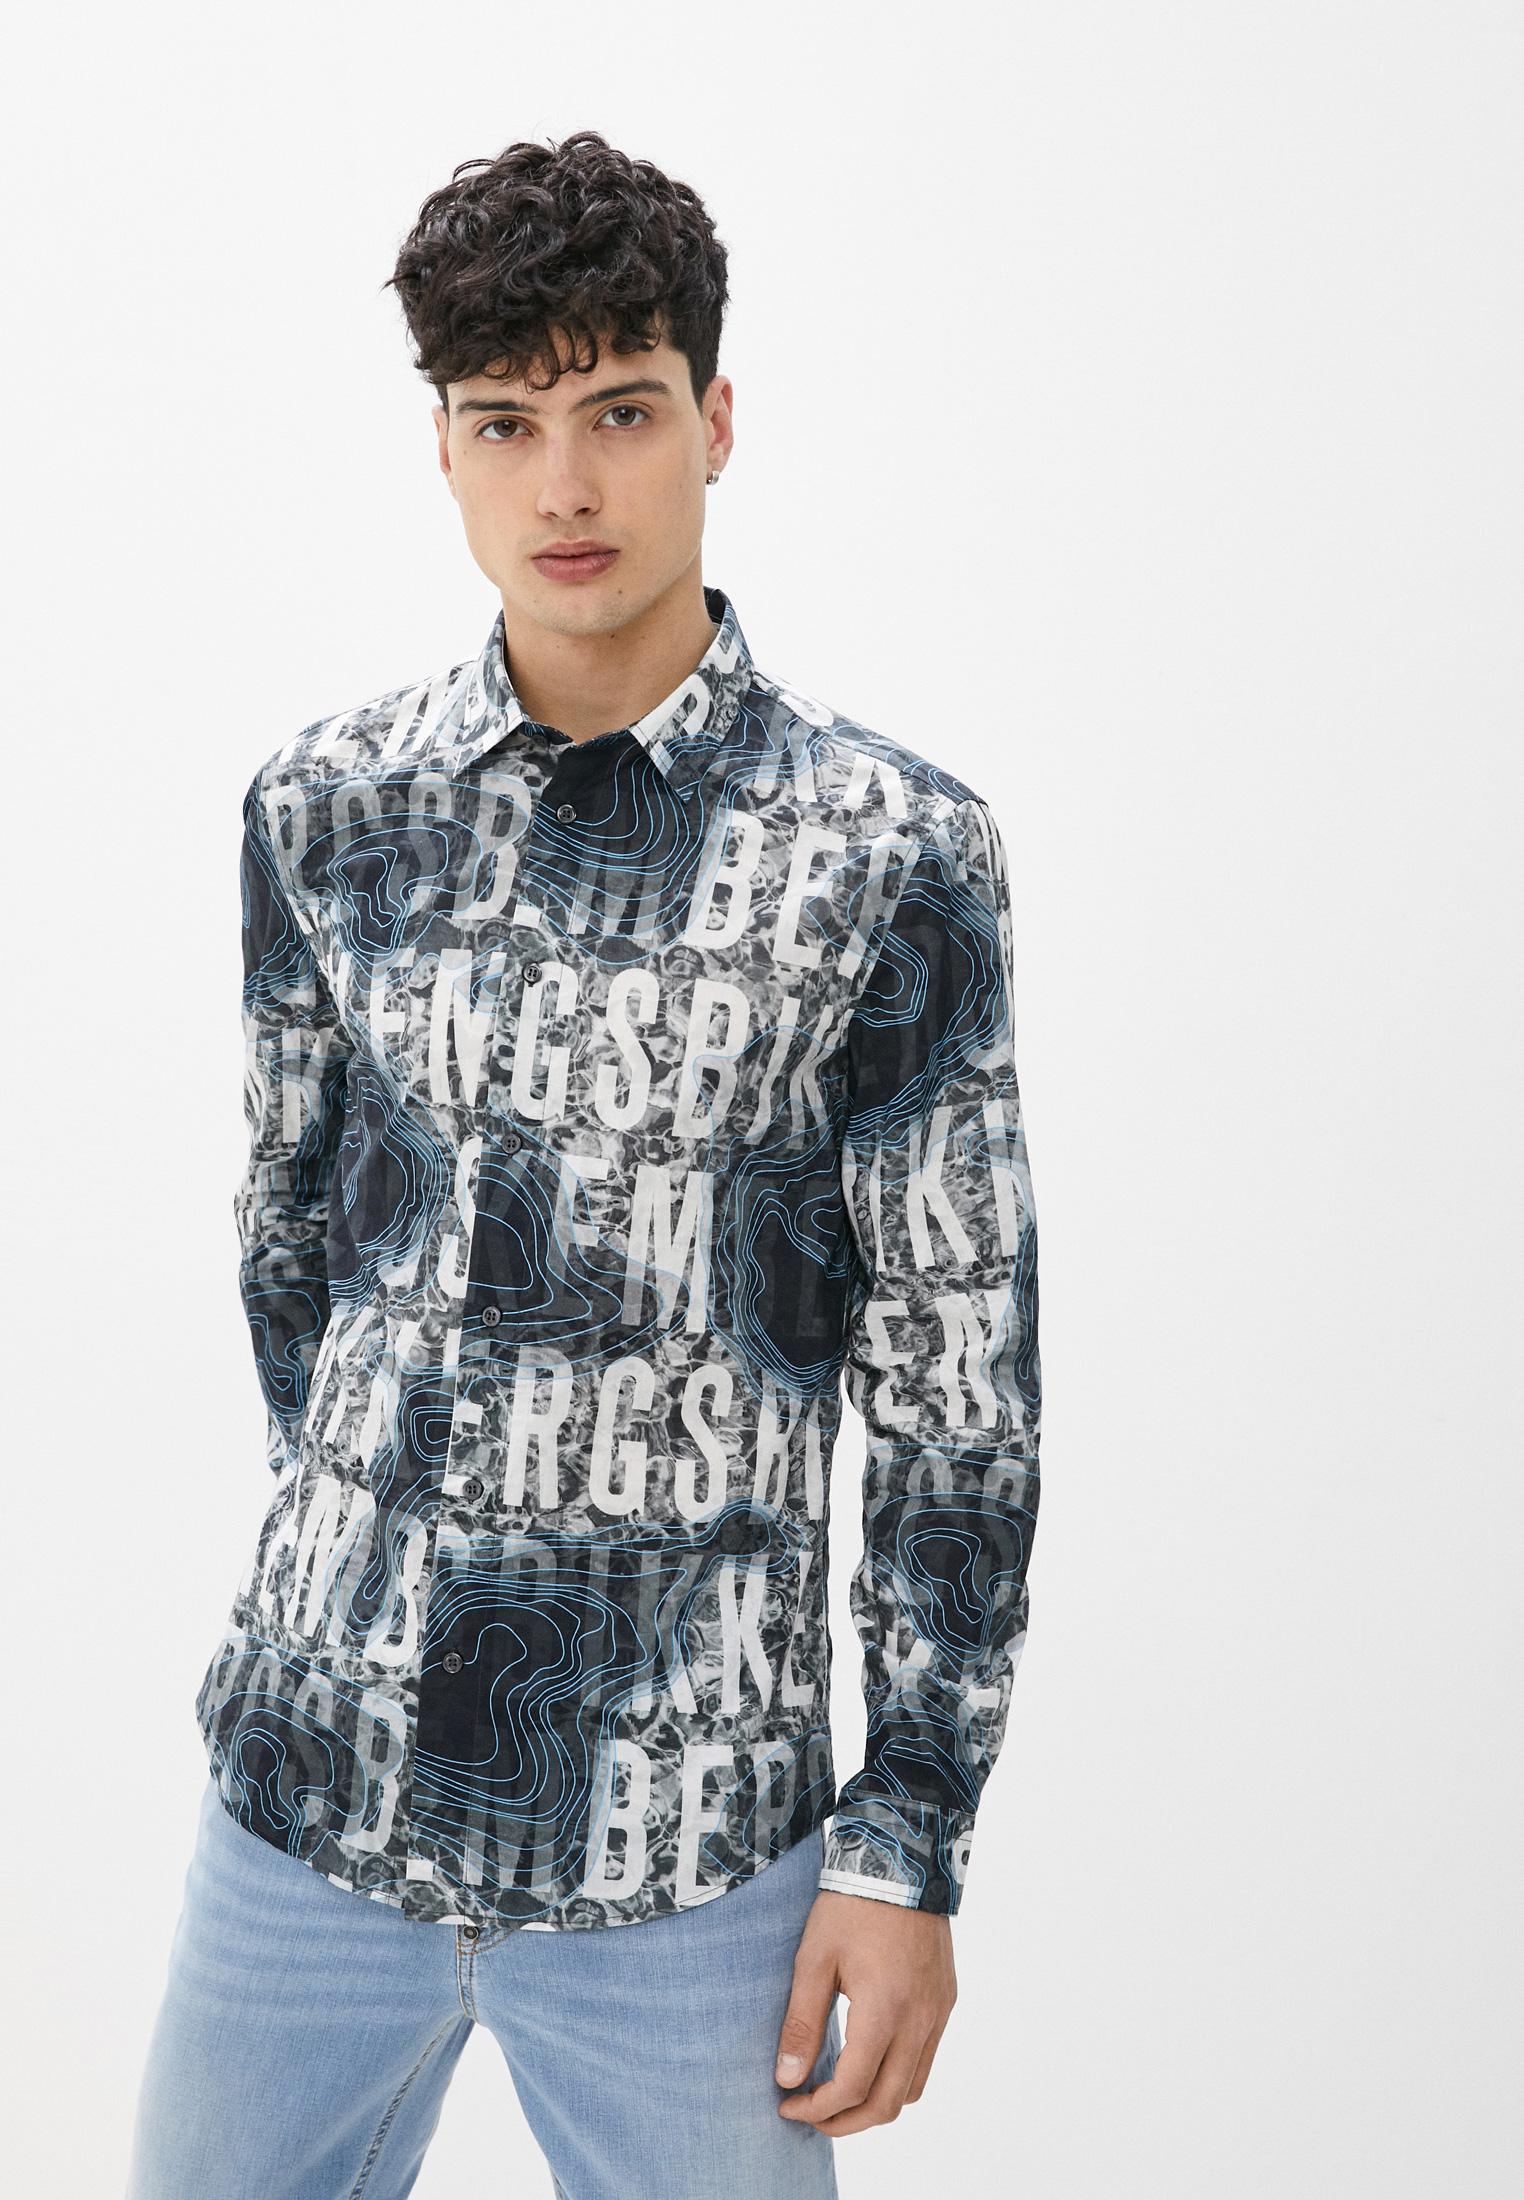 Рубашка с длинным рукавом Bikkembergs C C 009 80 T 123A